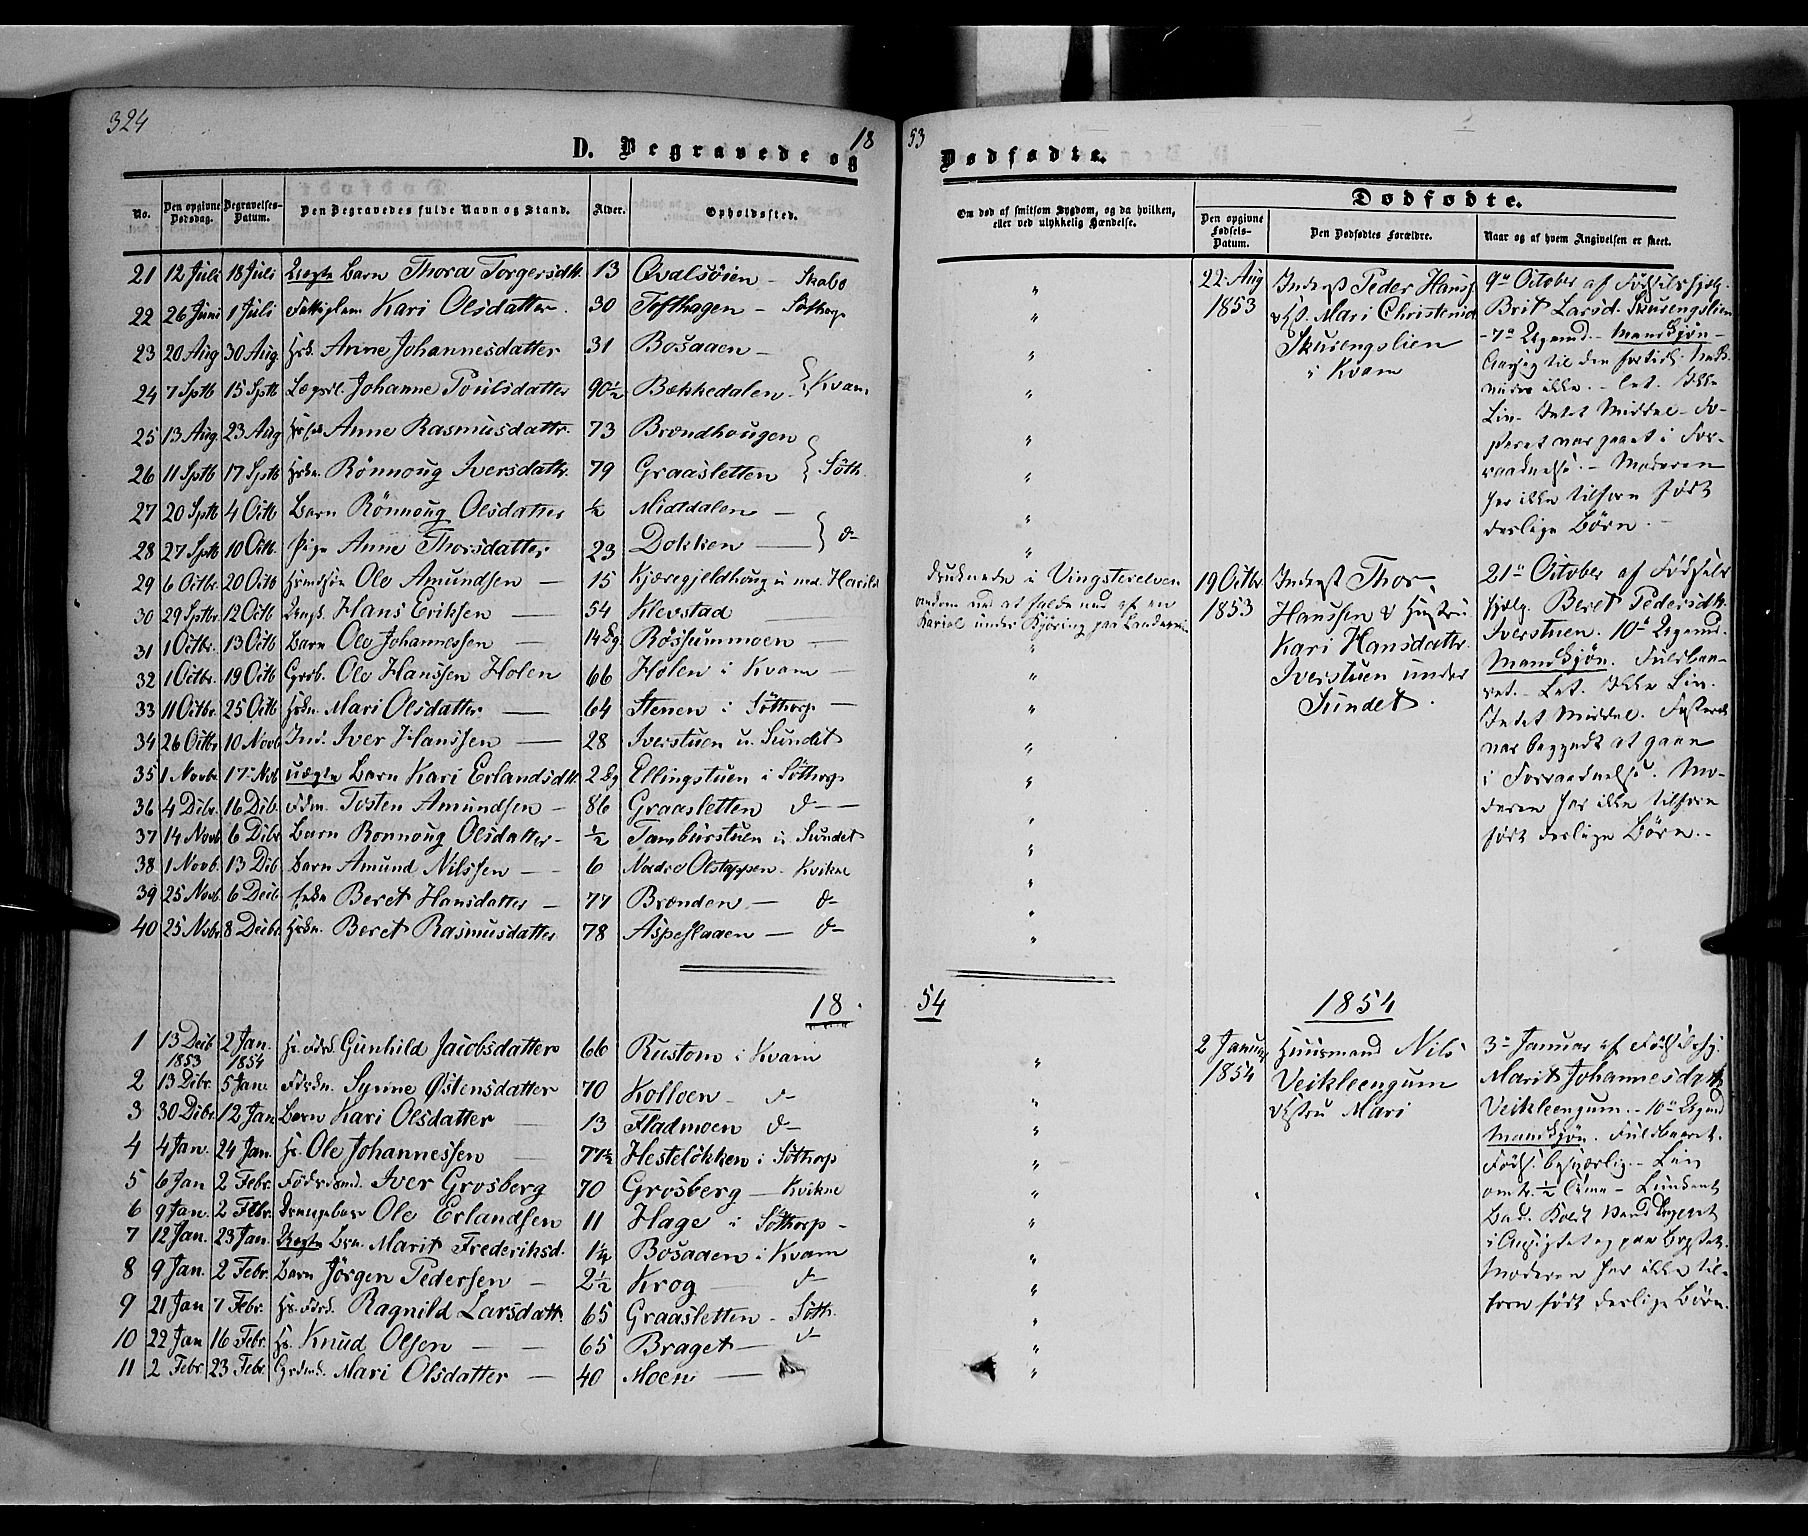 SAH, Nord-Fron prestekontor, Ministerialbok nr. 1, 1851-1864, s. 324